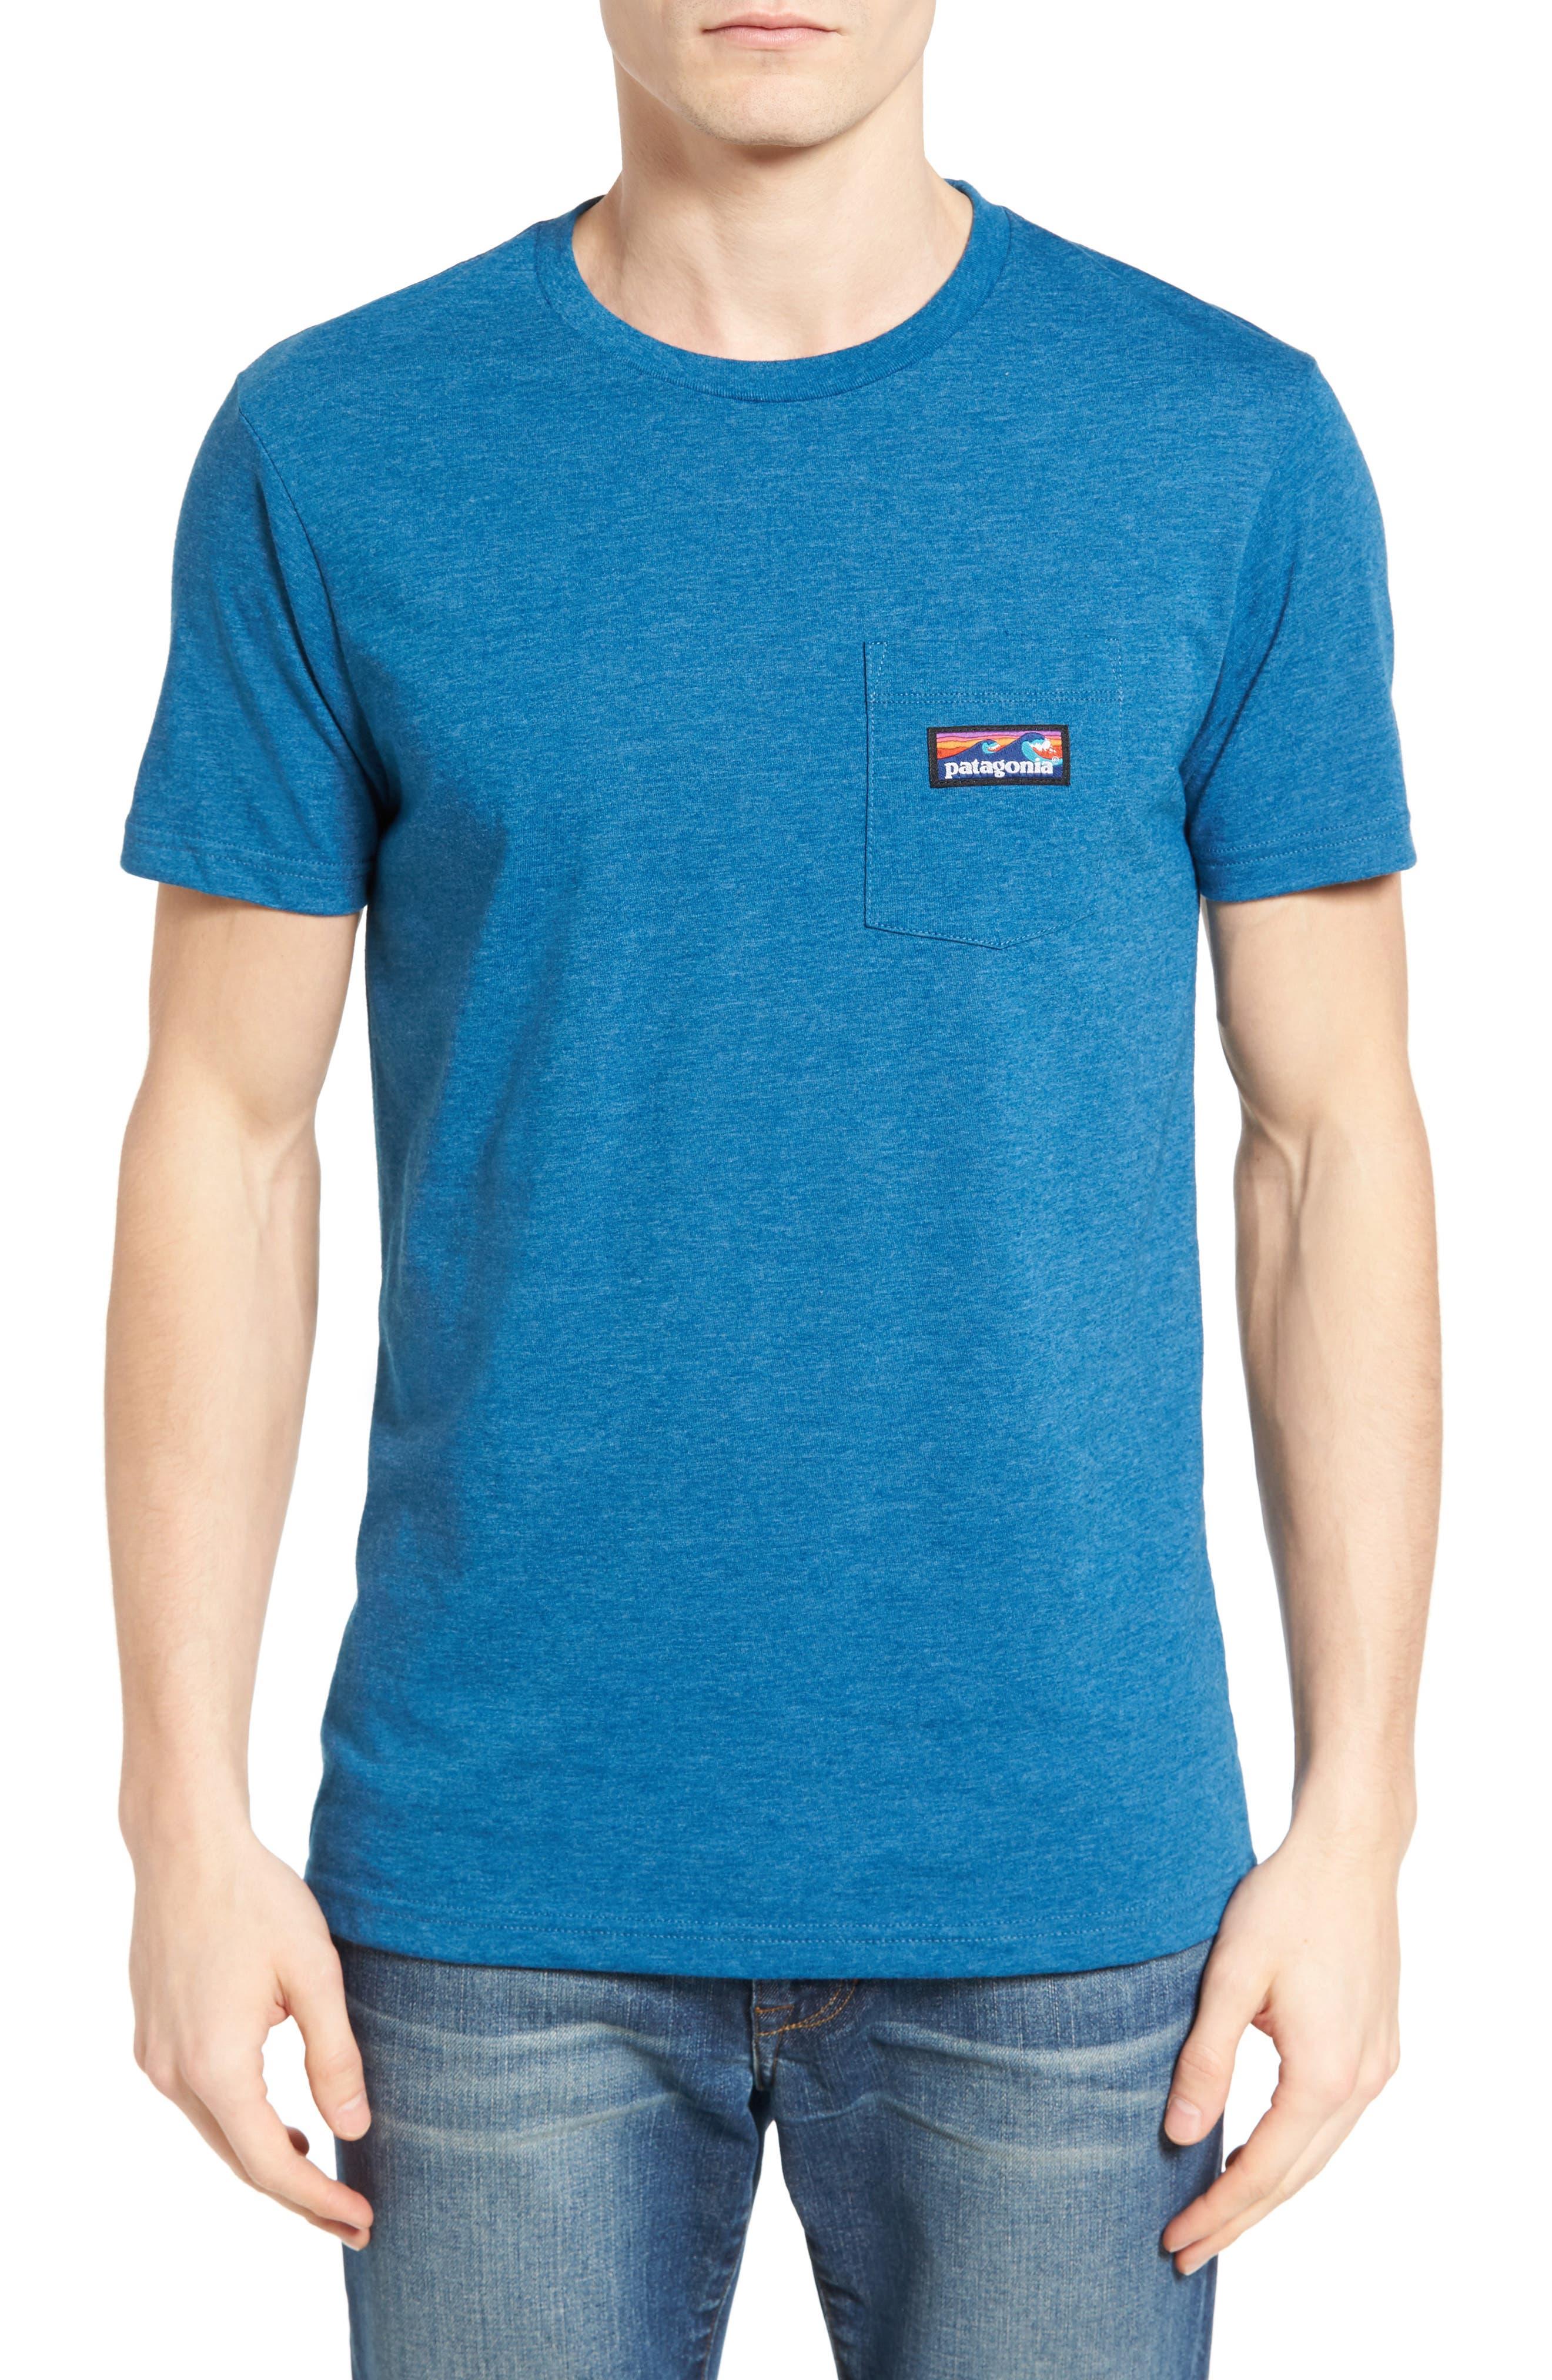 Board Short Label T-Shirt,                             Main thumbnail 1, color,